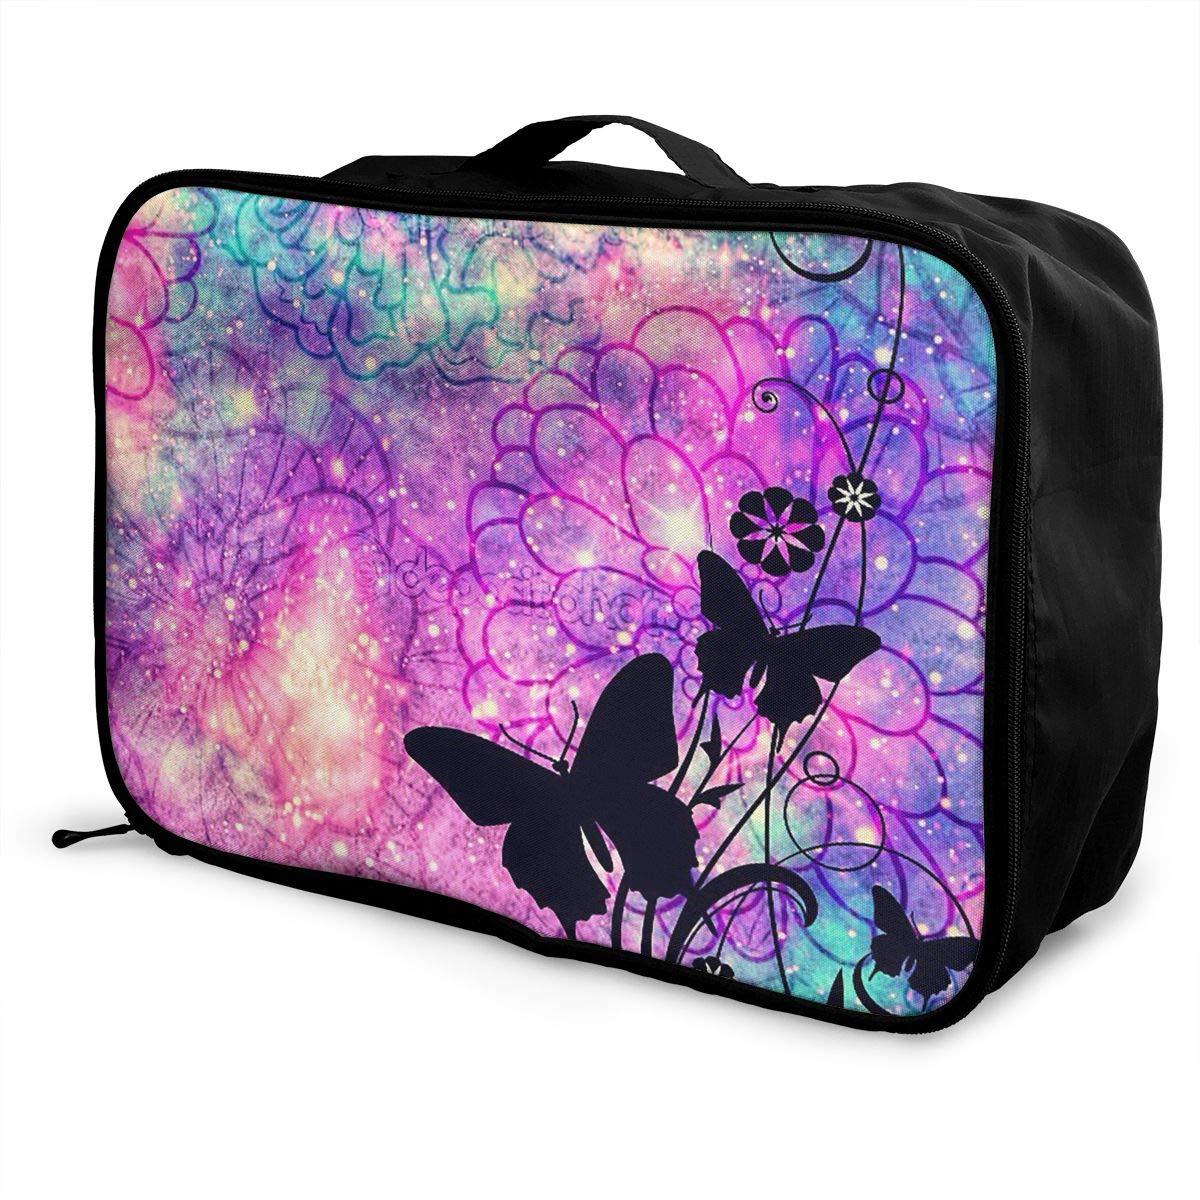 Travel Luggage Duffle Bag Lightweight Portable Handbag Fantasy Butterfly Print Large Capacity Waterproof Foldable Storage Tote